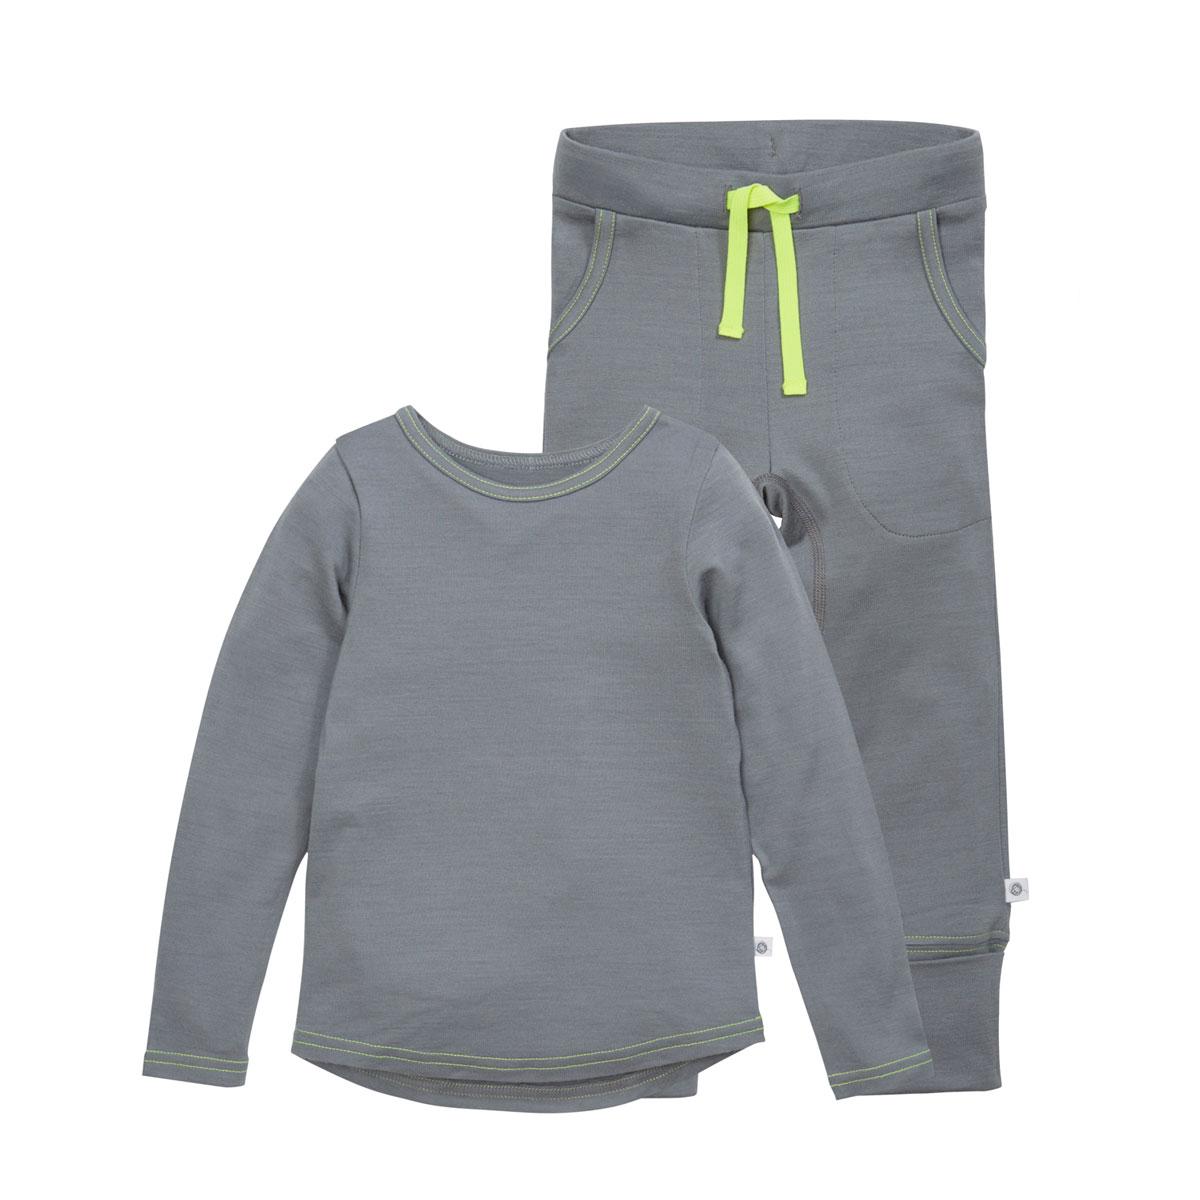 Merino skiwear bundle, Smalls